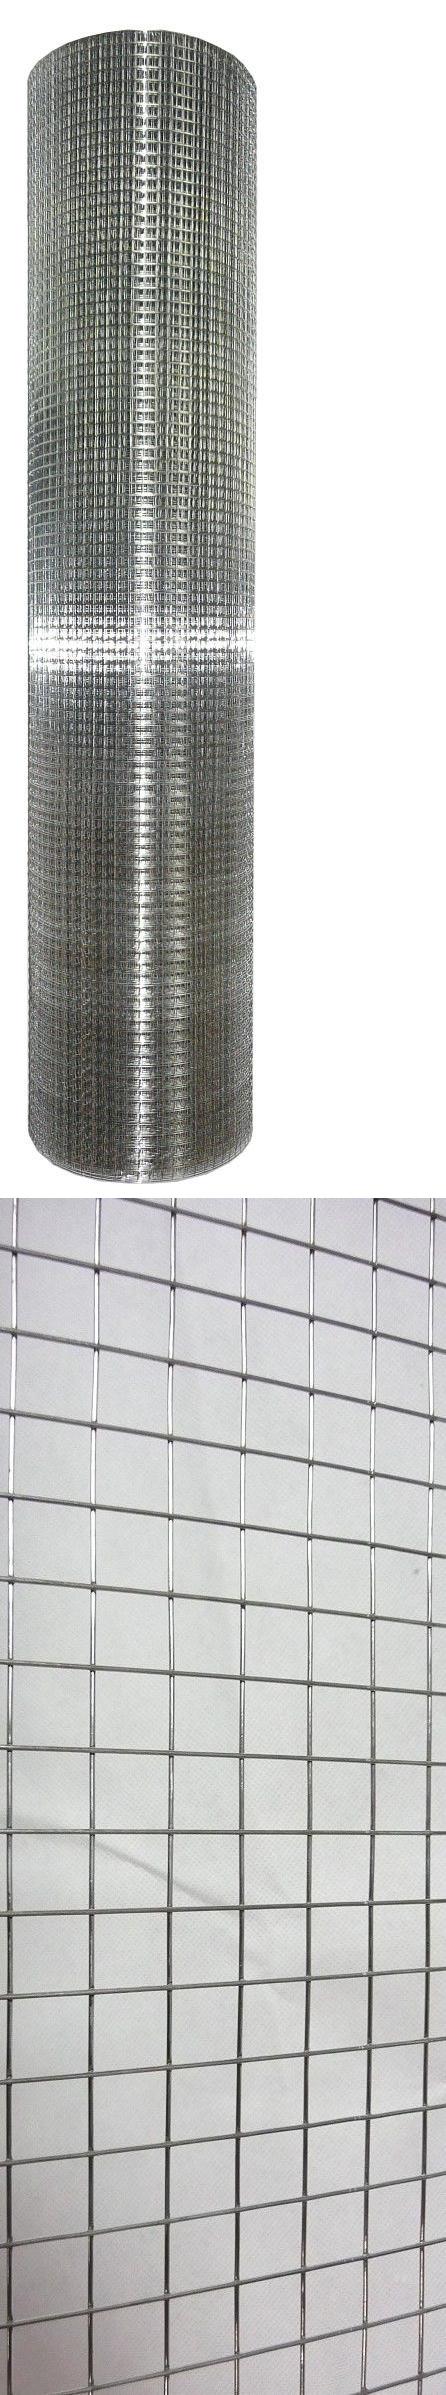 Hardware Cloth Metal Mesh 180985: Galvanized Metal Hardware Cloth ...